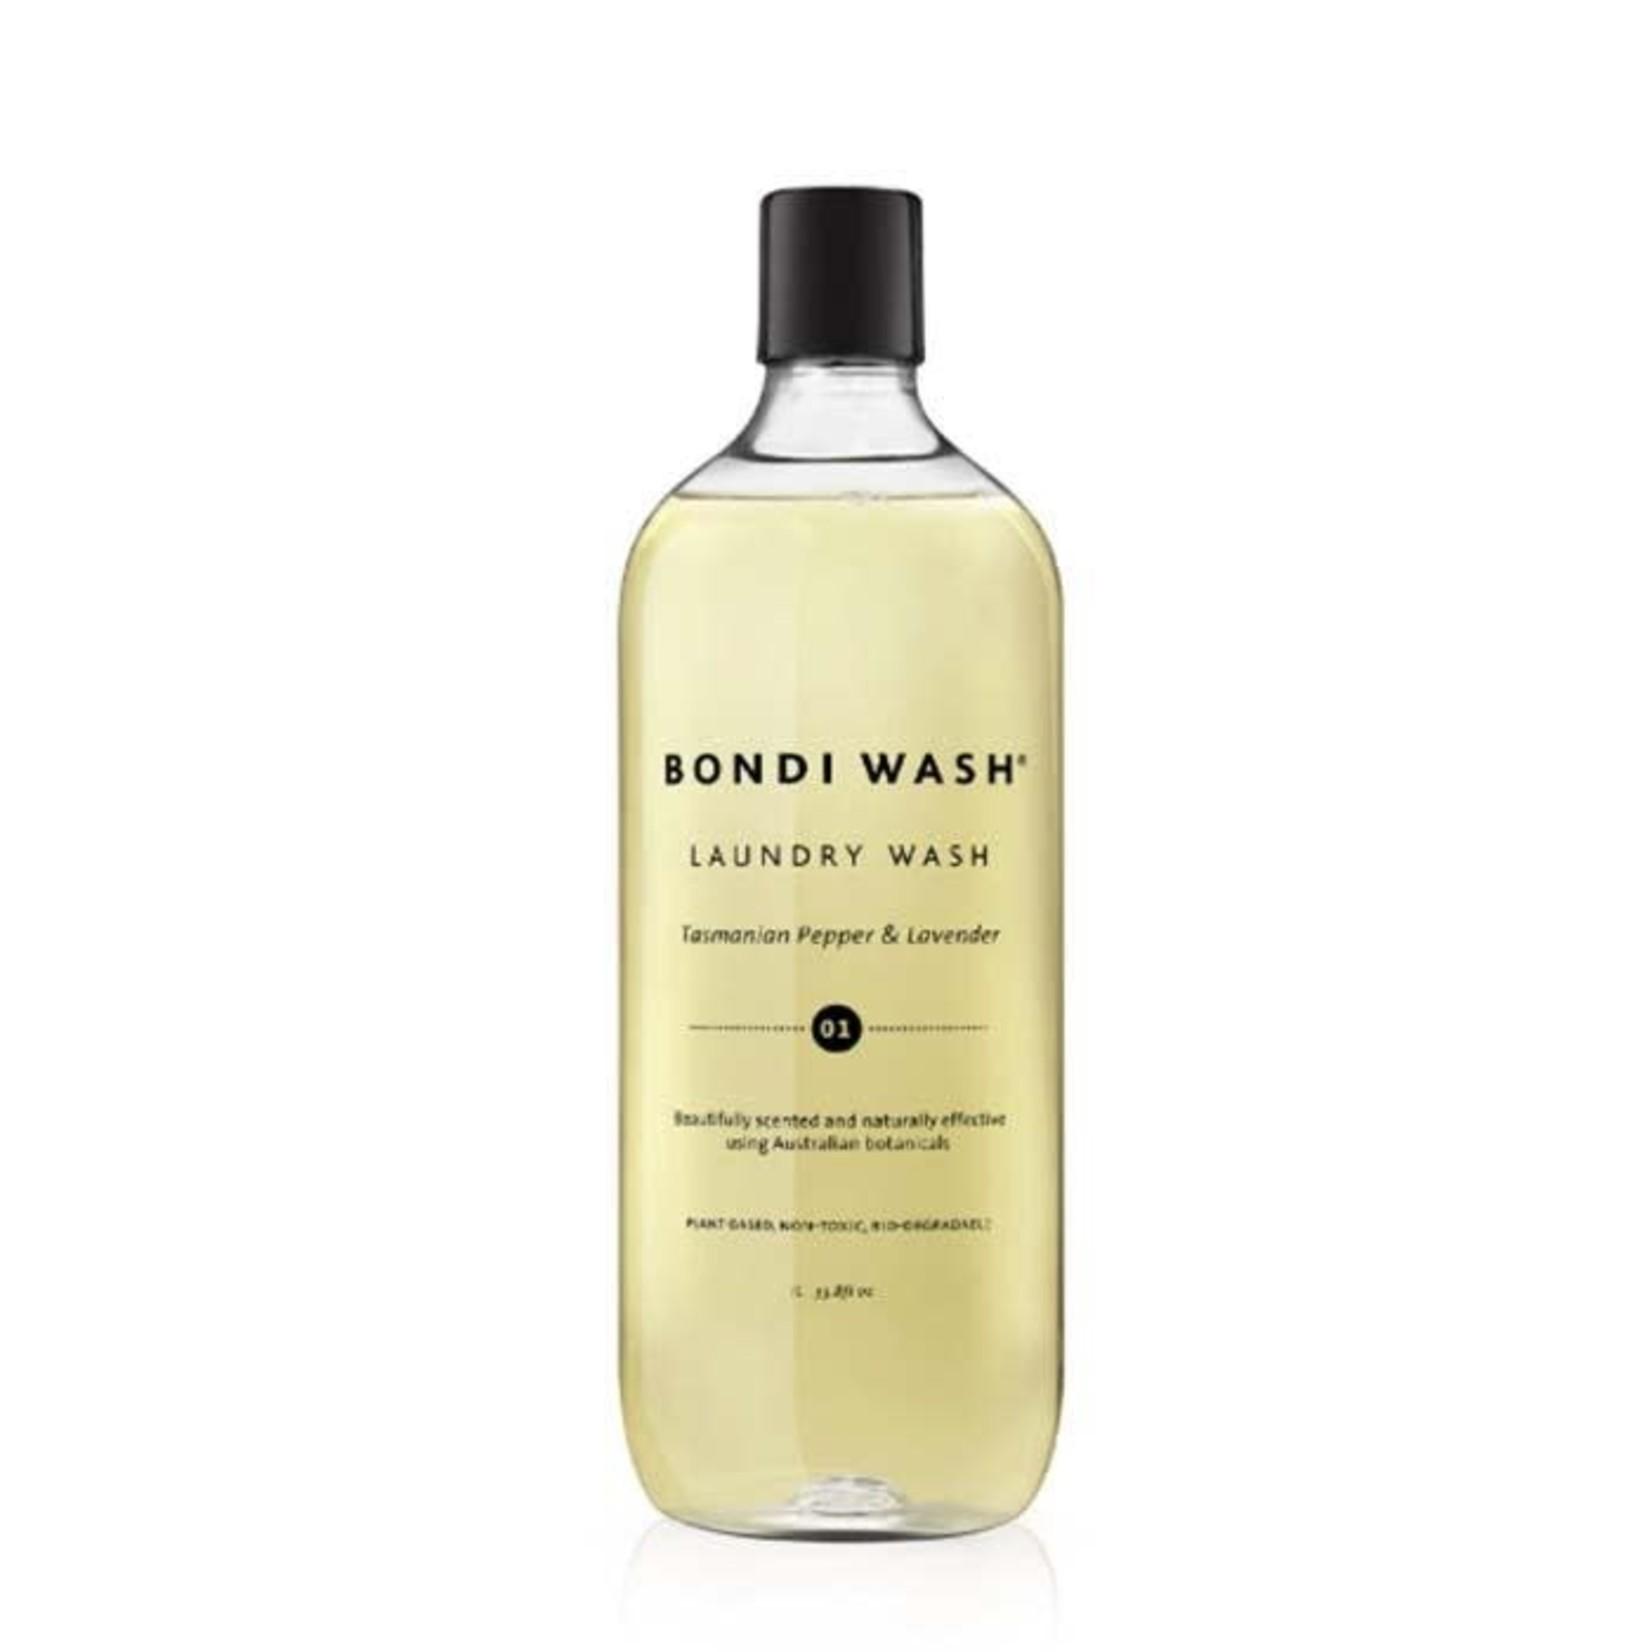 Bondi Wash Laundry Wash 1 L